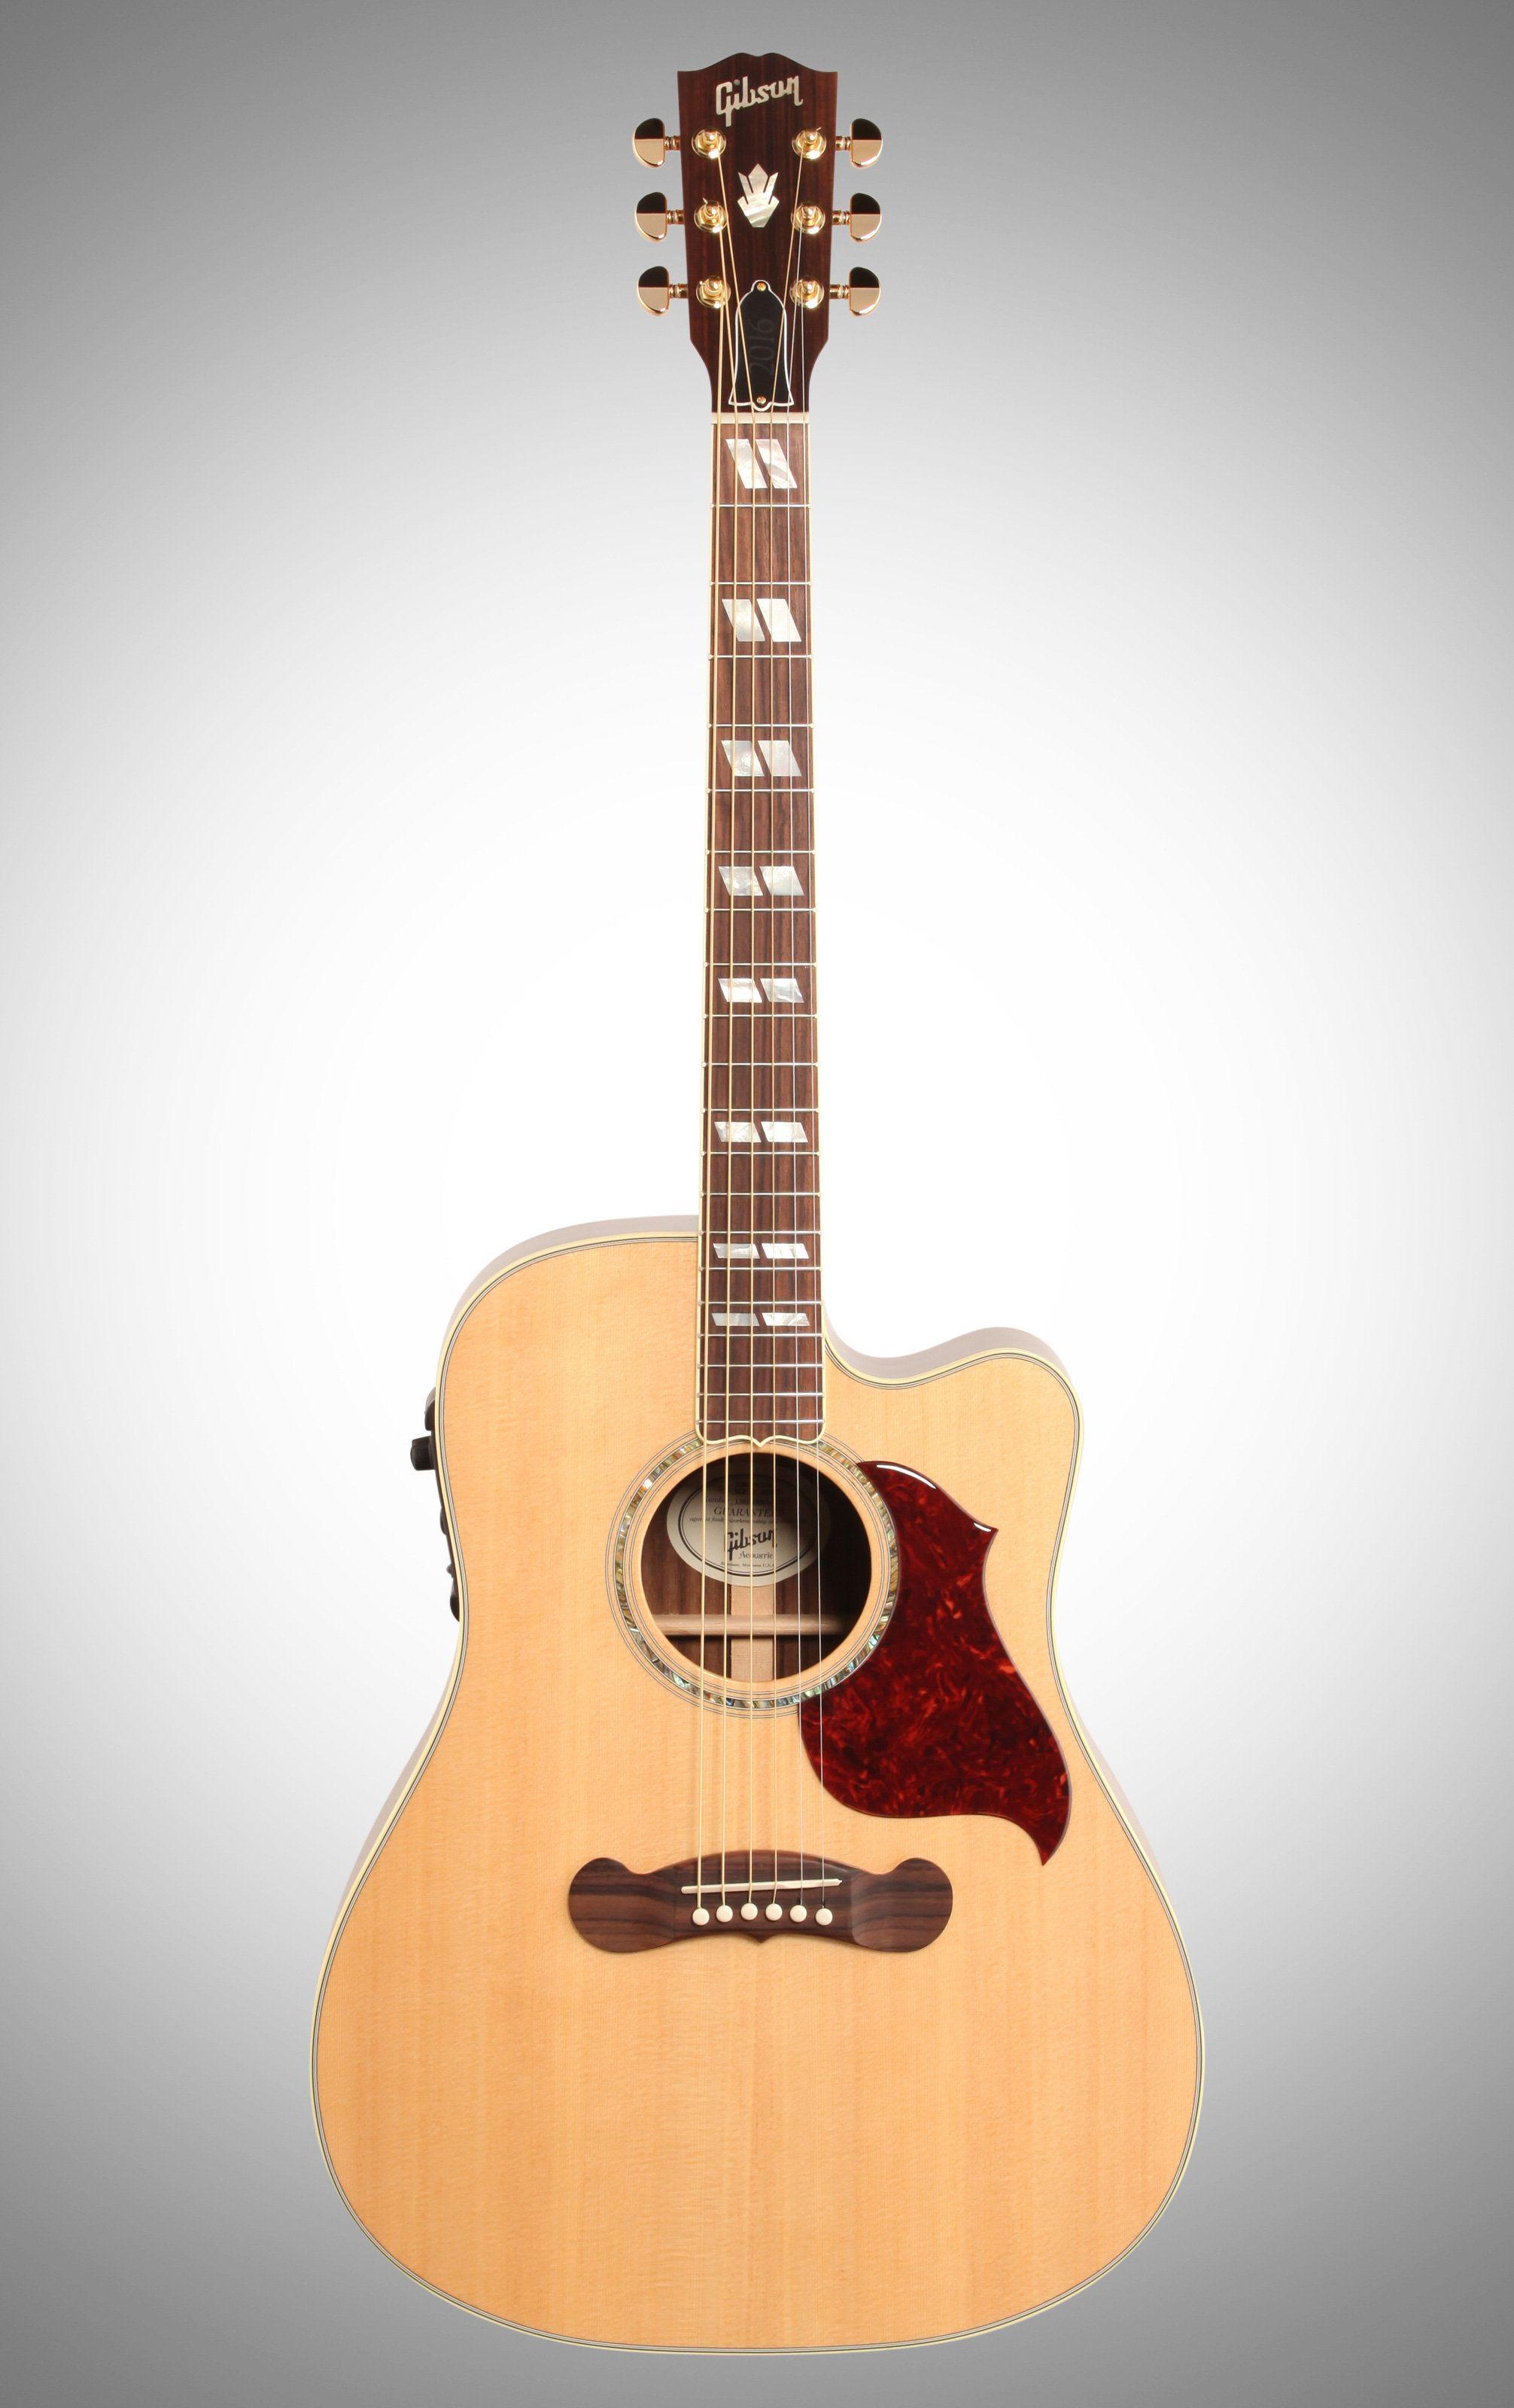 Gibson 2016 Songwriter Studio Cutaway Acoustic Electric Guitar Acoustic Guitar Photography Guitar Guild Acoustic Guitars